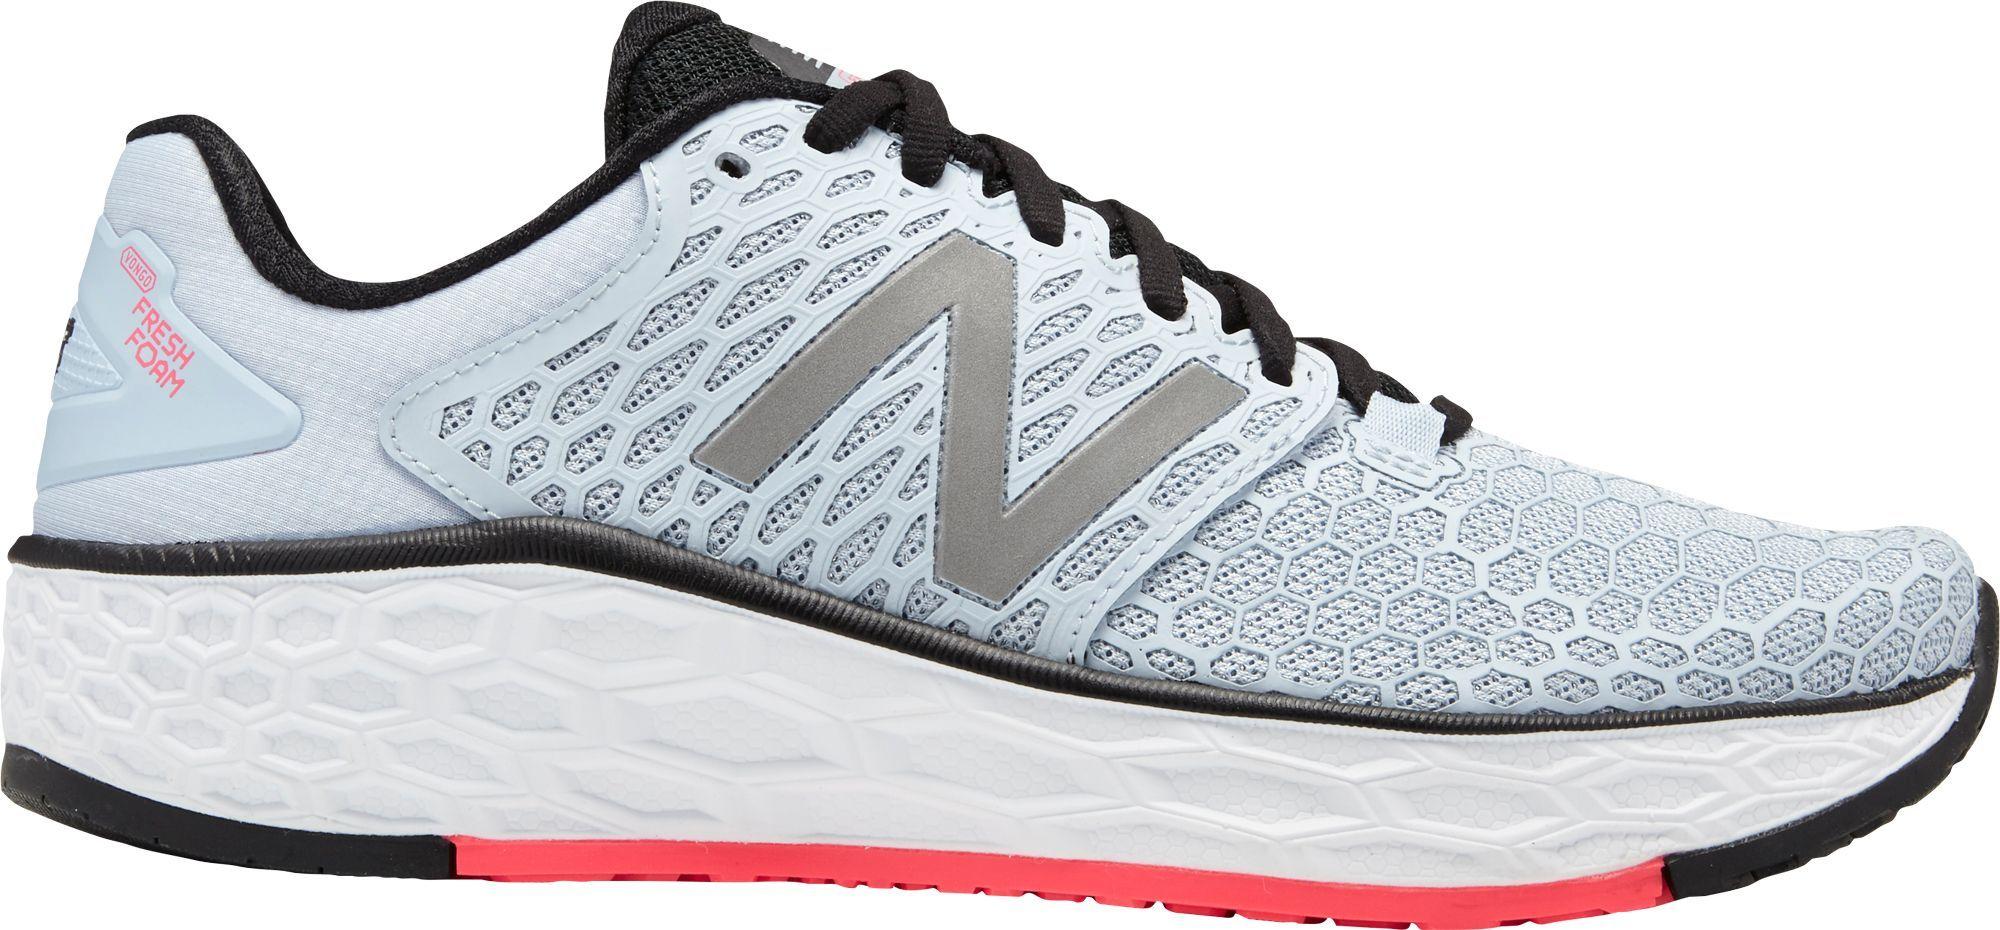 New Balance Women's Fresh Foam Vongo v3 Running Shoes, Size ...